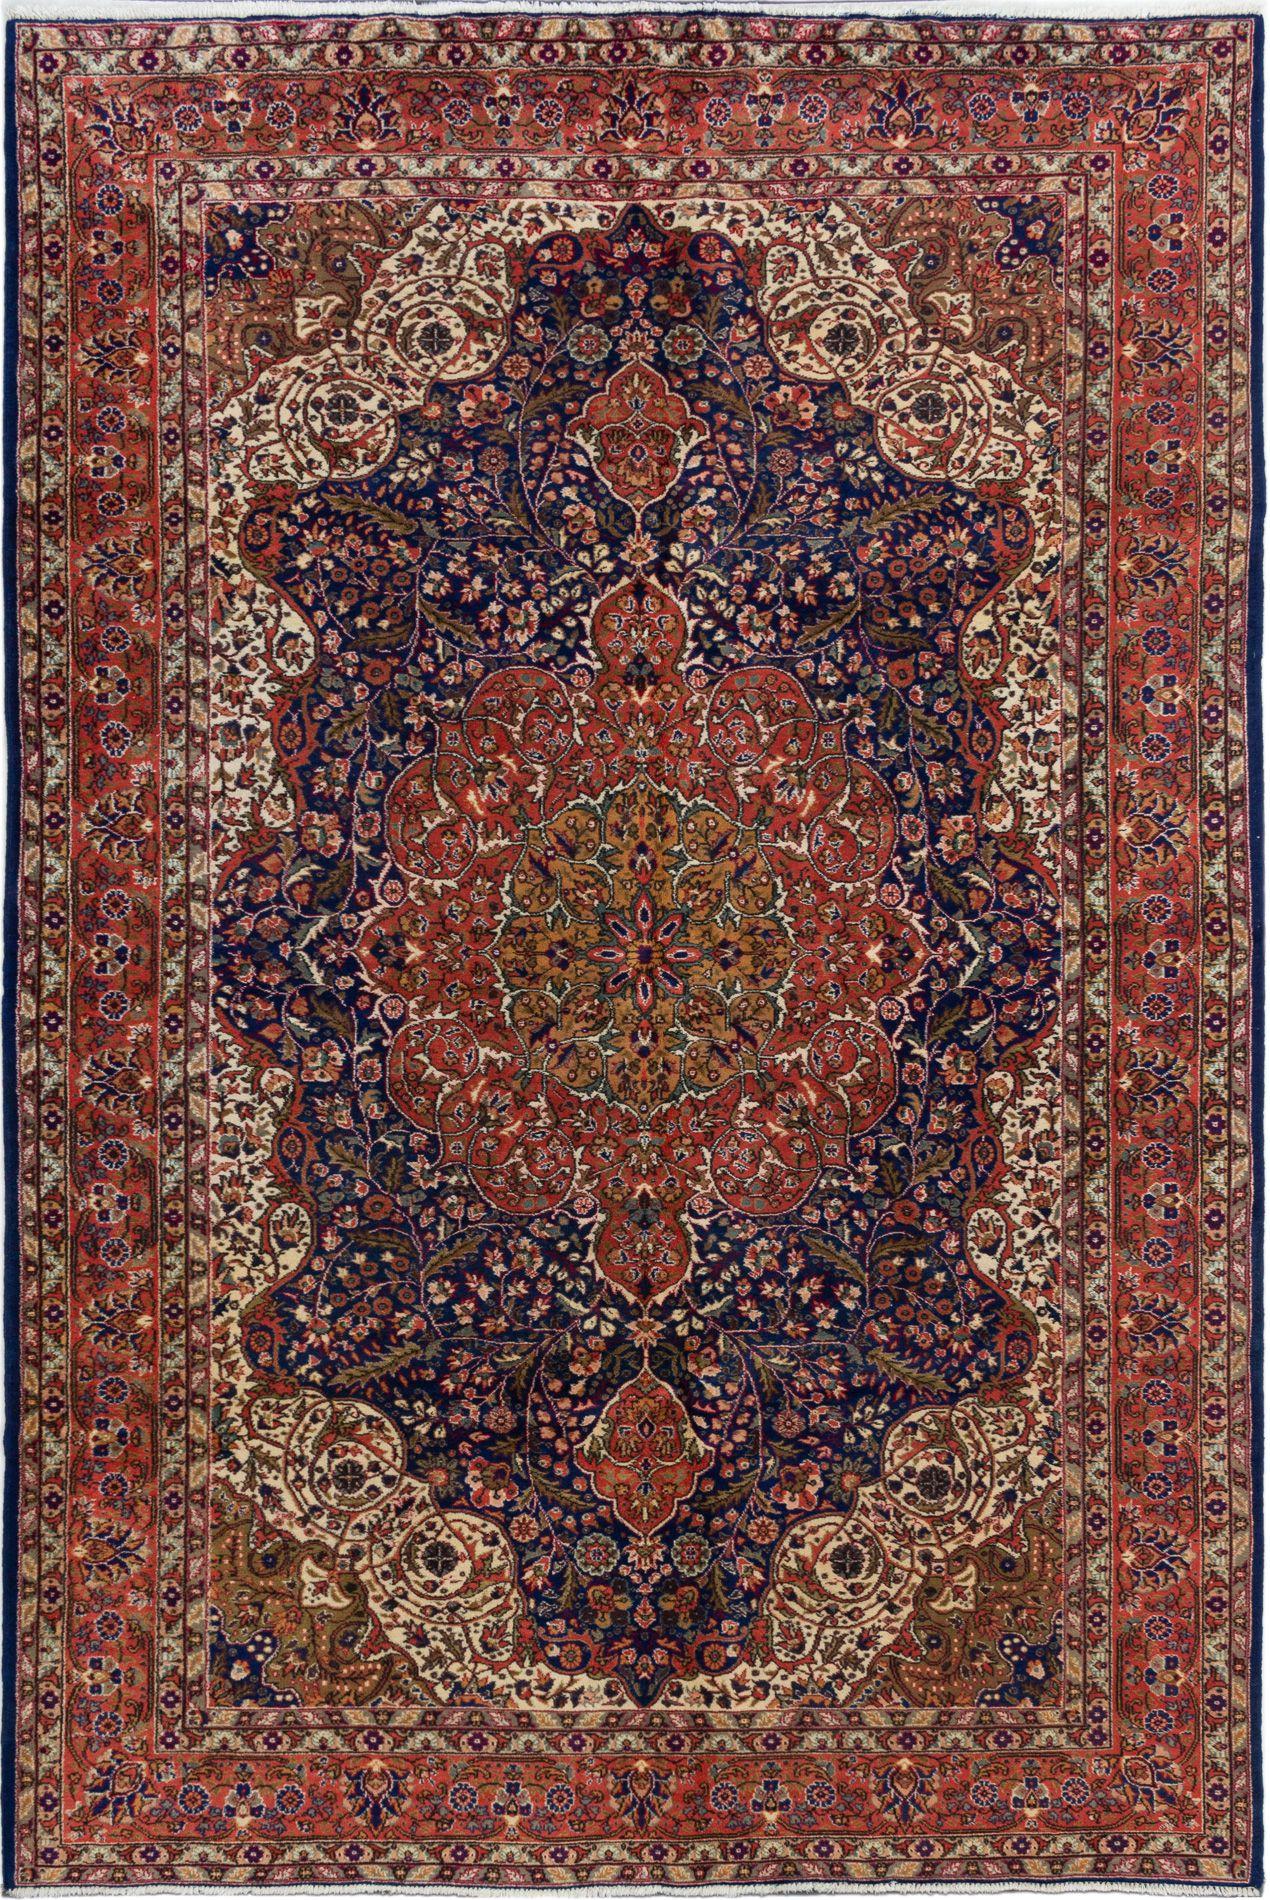 "Hand-knotted Hereke Dark Copper, Navy Blue Wool Rug 6'8"" x 10'0"" Size: 6'8"" x 10'0"""